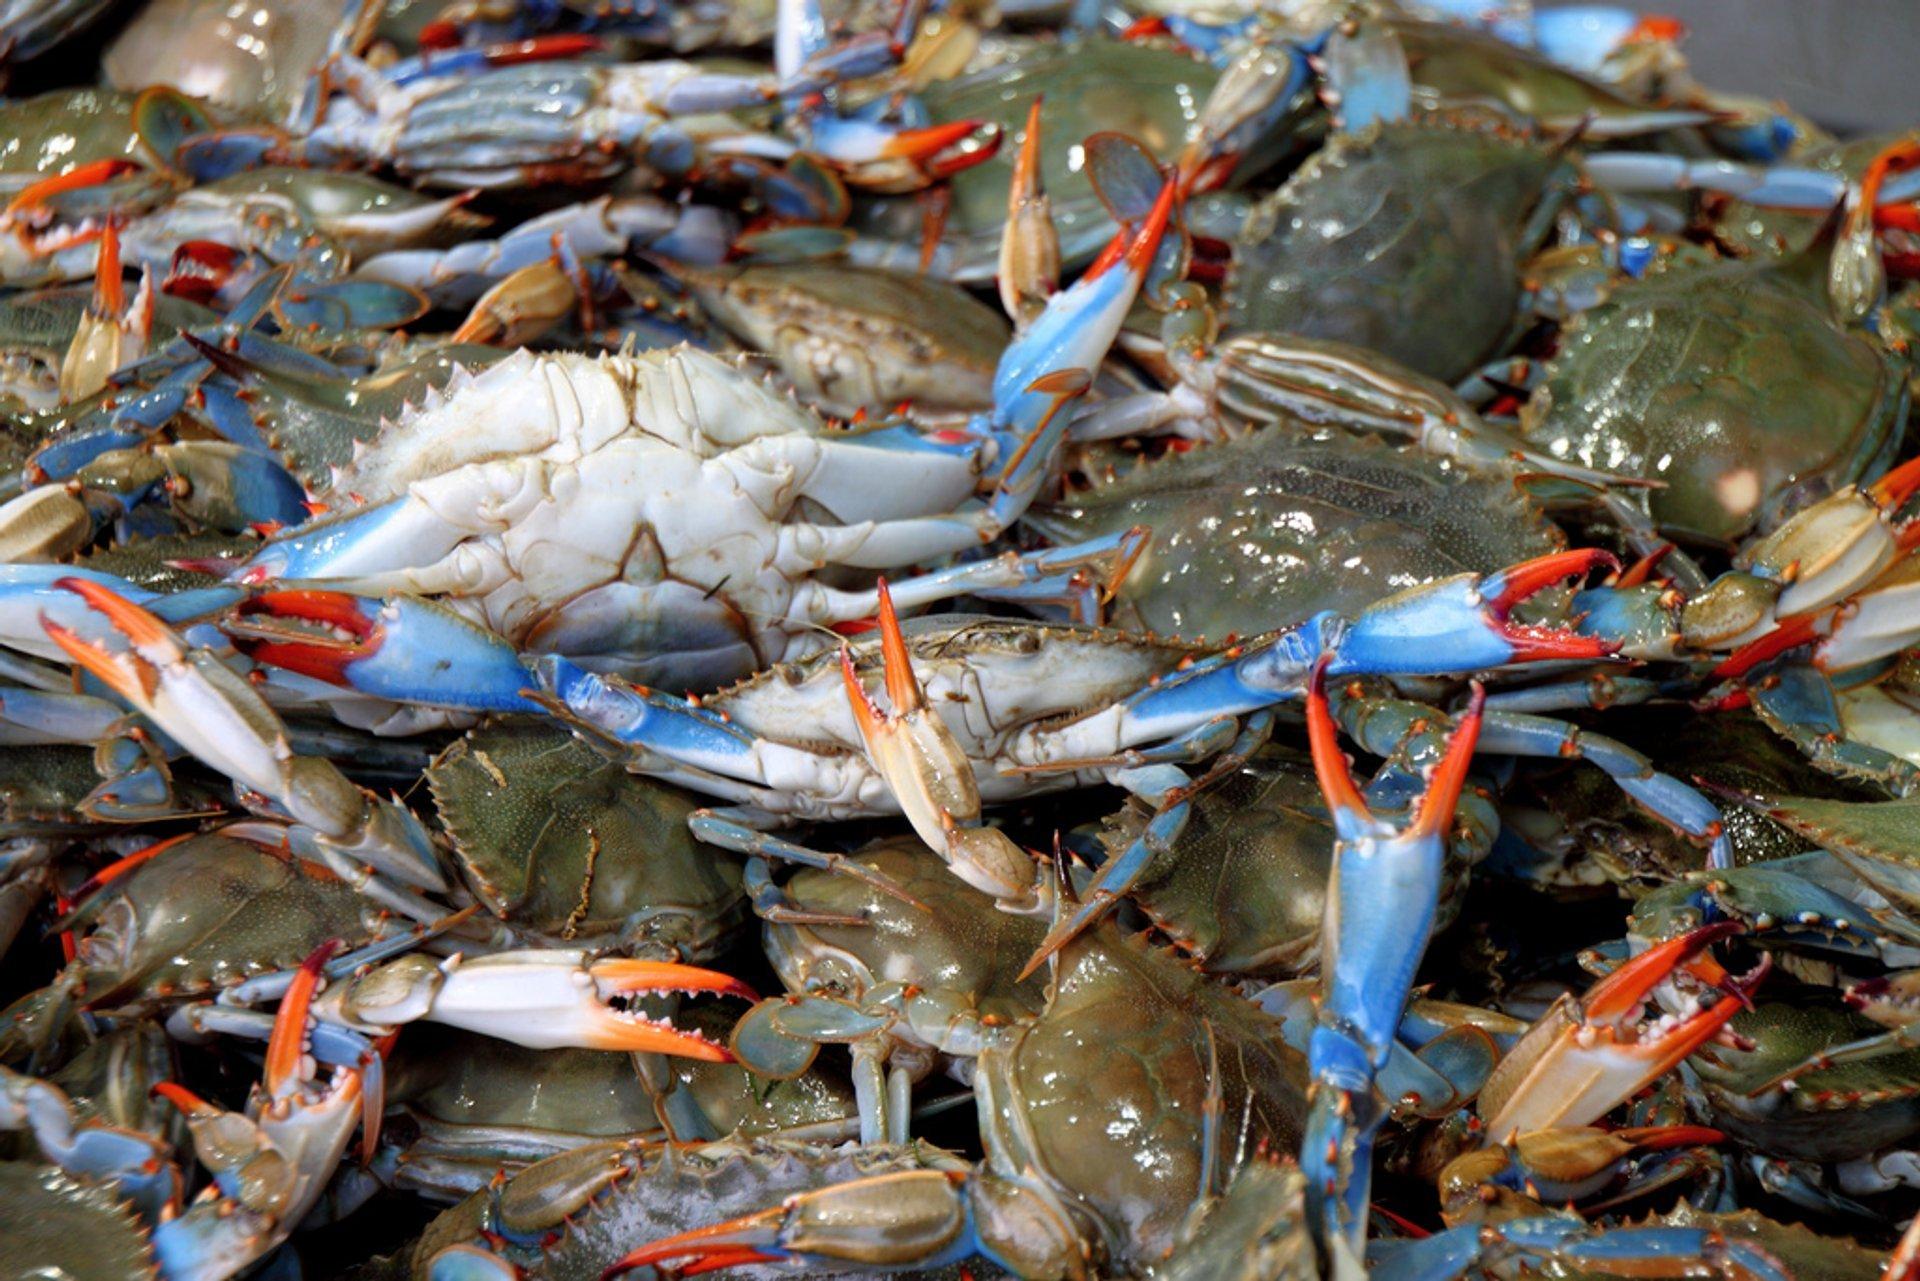 Chesapeake Bay Blue Crab in Washington, D.C. - Best Time